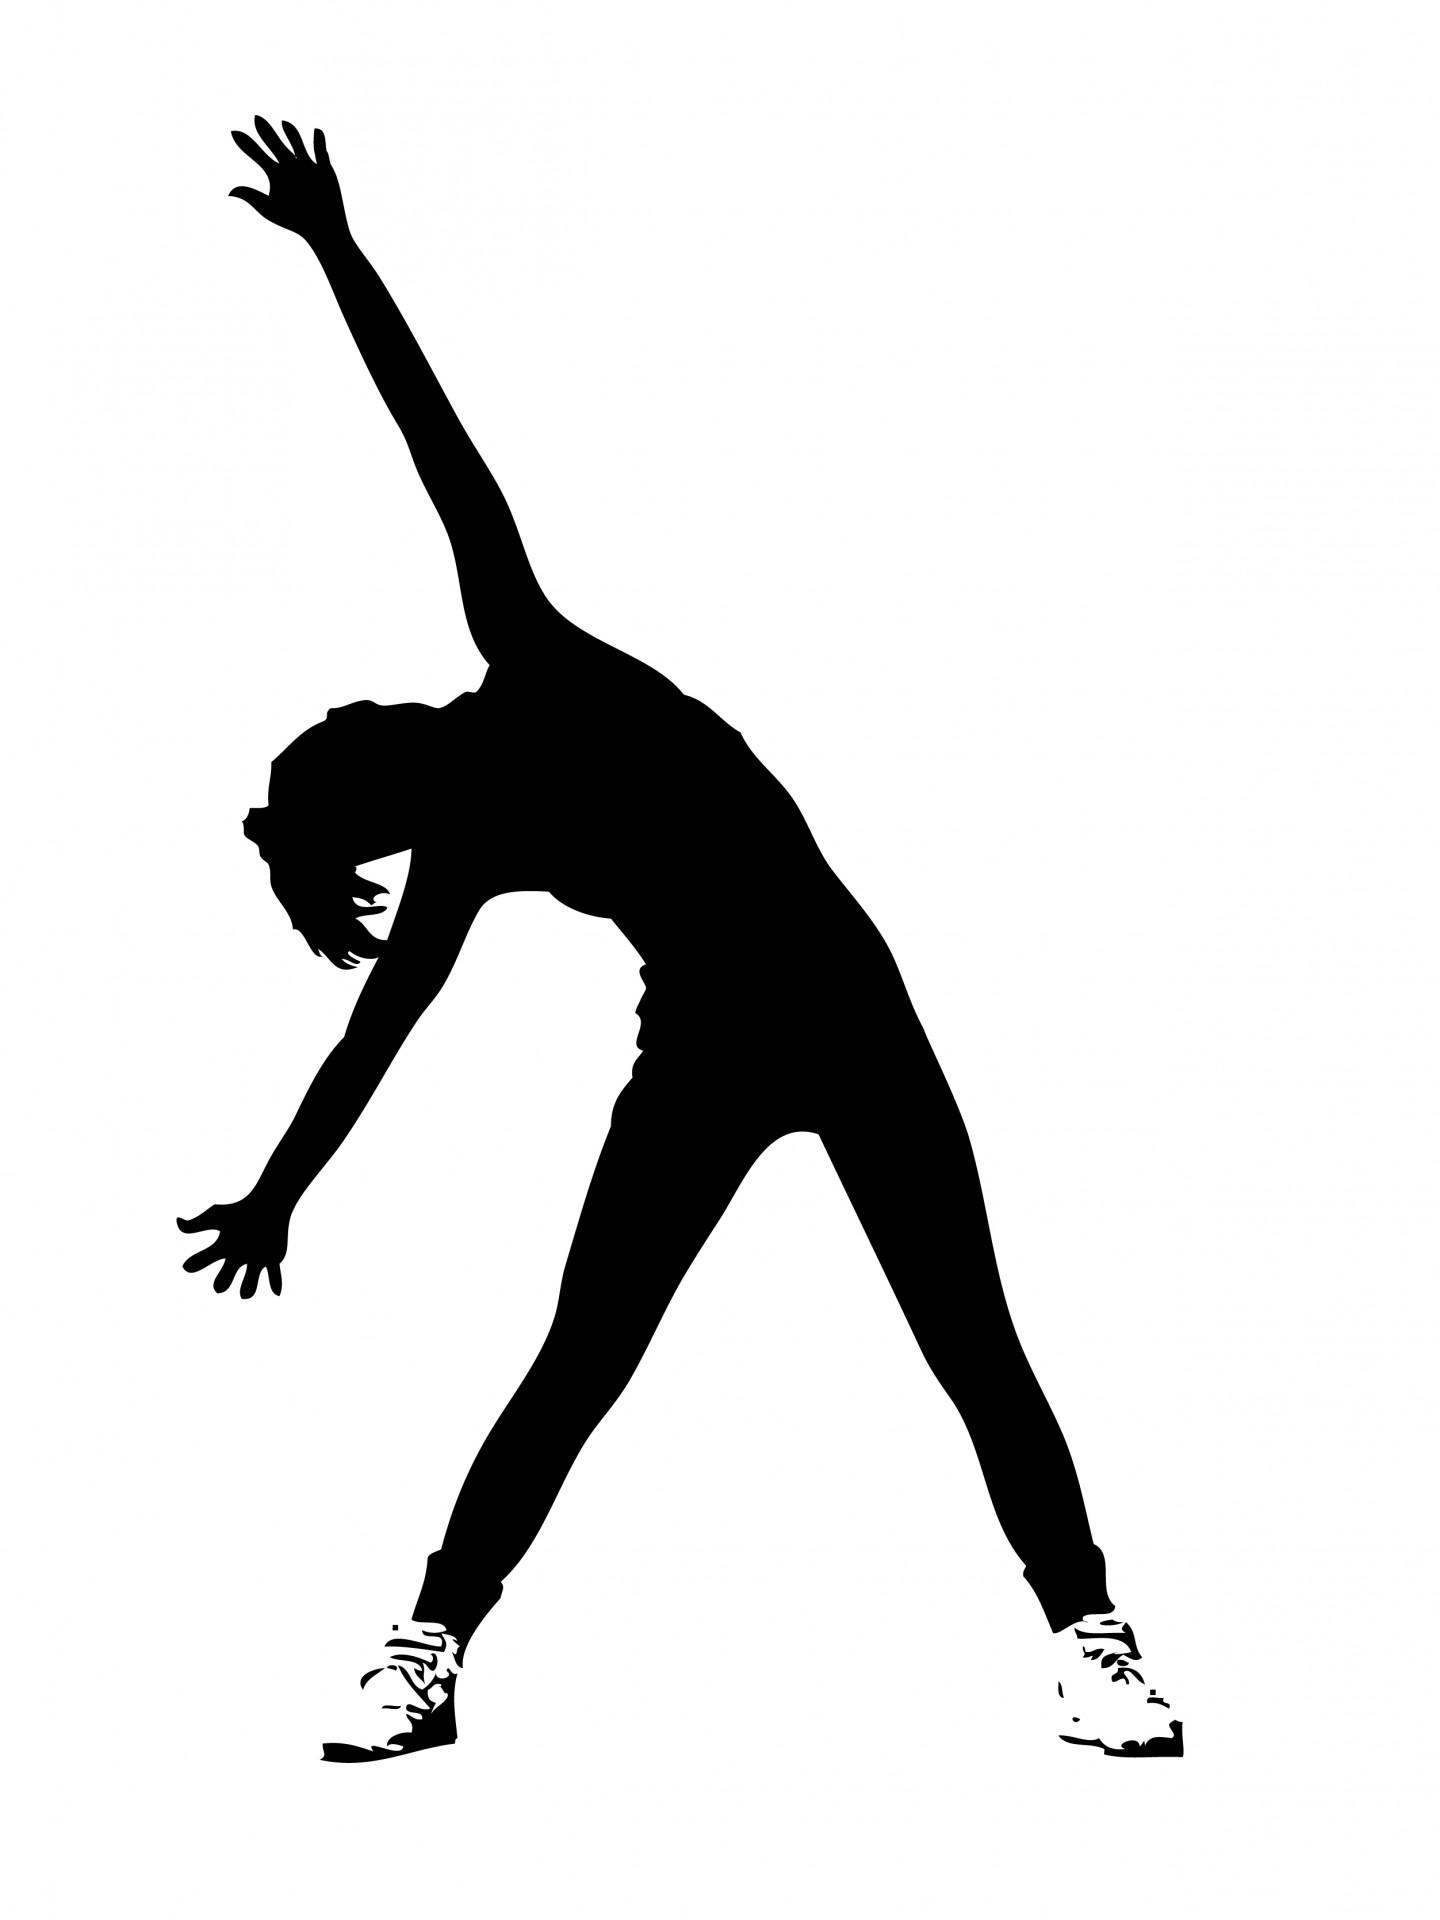 Exercise clipart aerobic, Exercise aerobic Transparent FREE.